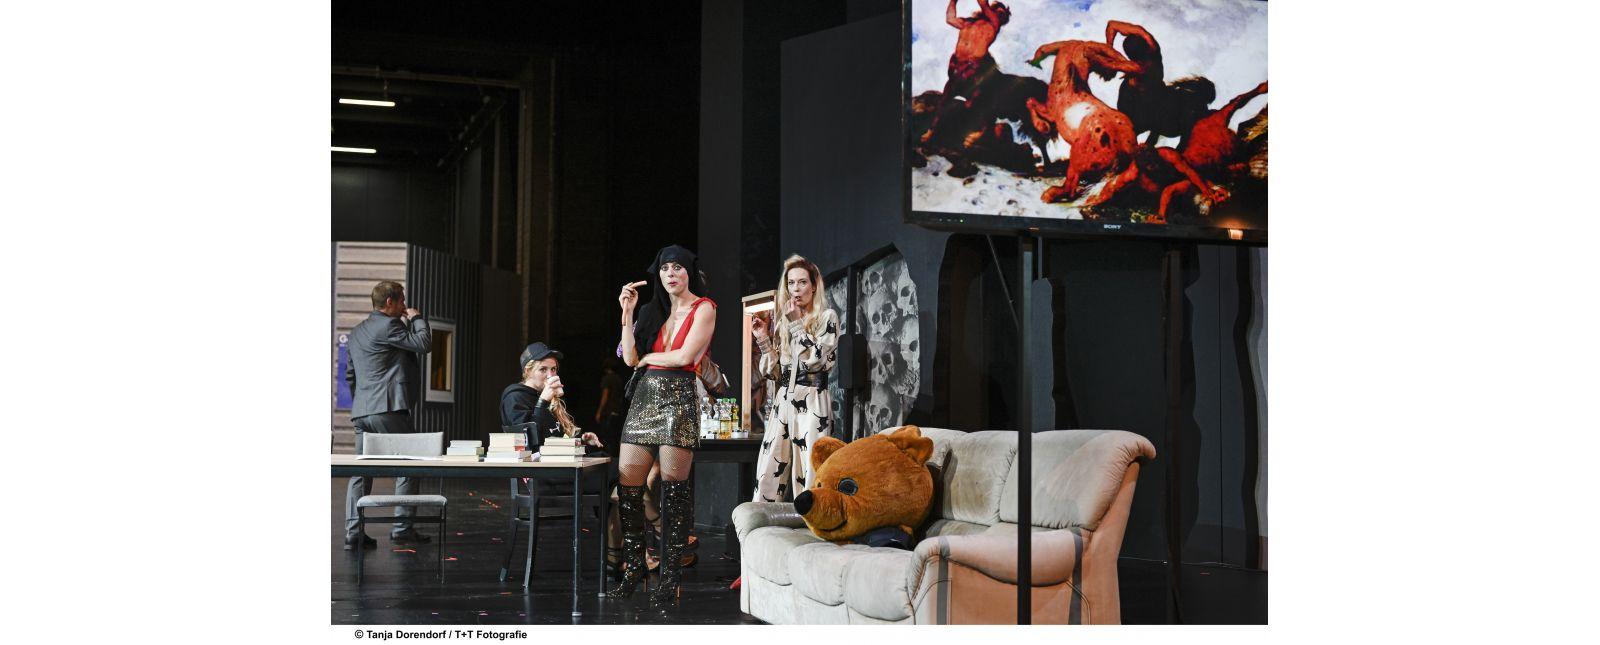 WUT // Martin Hohner / Marieke Kregel / Stefanie Mrachacz / Anja Schweitzer // 2019 // Tanja Dorendorf / T + T Fotografie